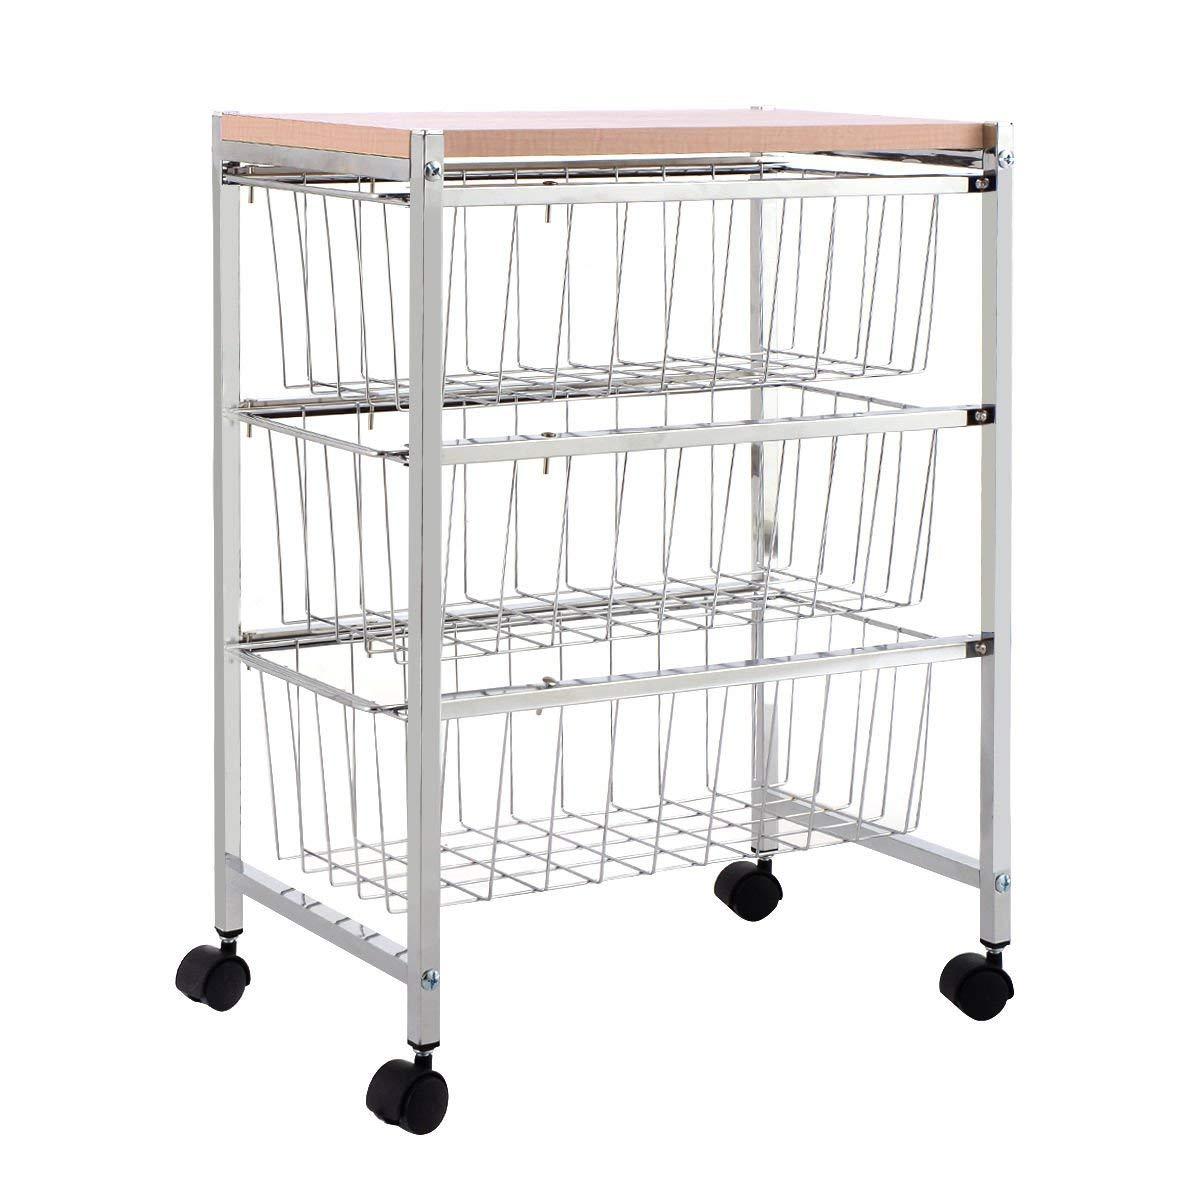 Metal 3-Tier Rolling Trolley Cart Baskets Rack Storage w/Wood Top & Wheel with Ebook